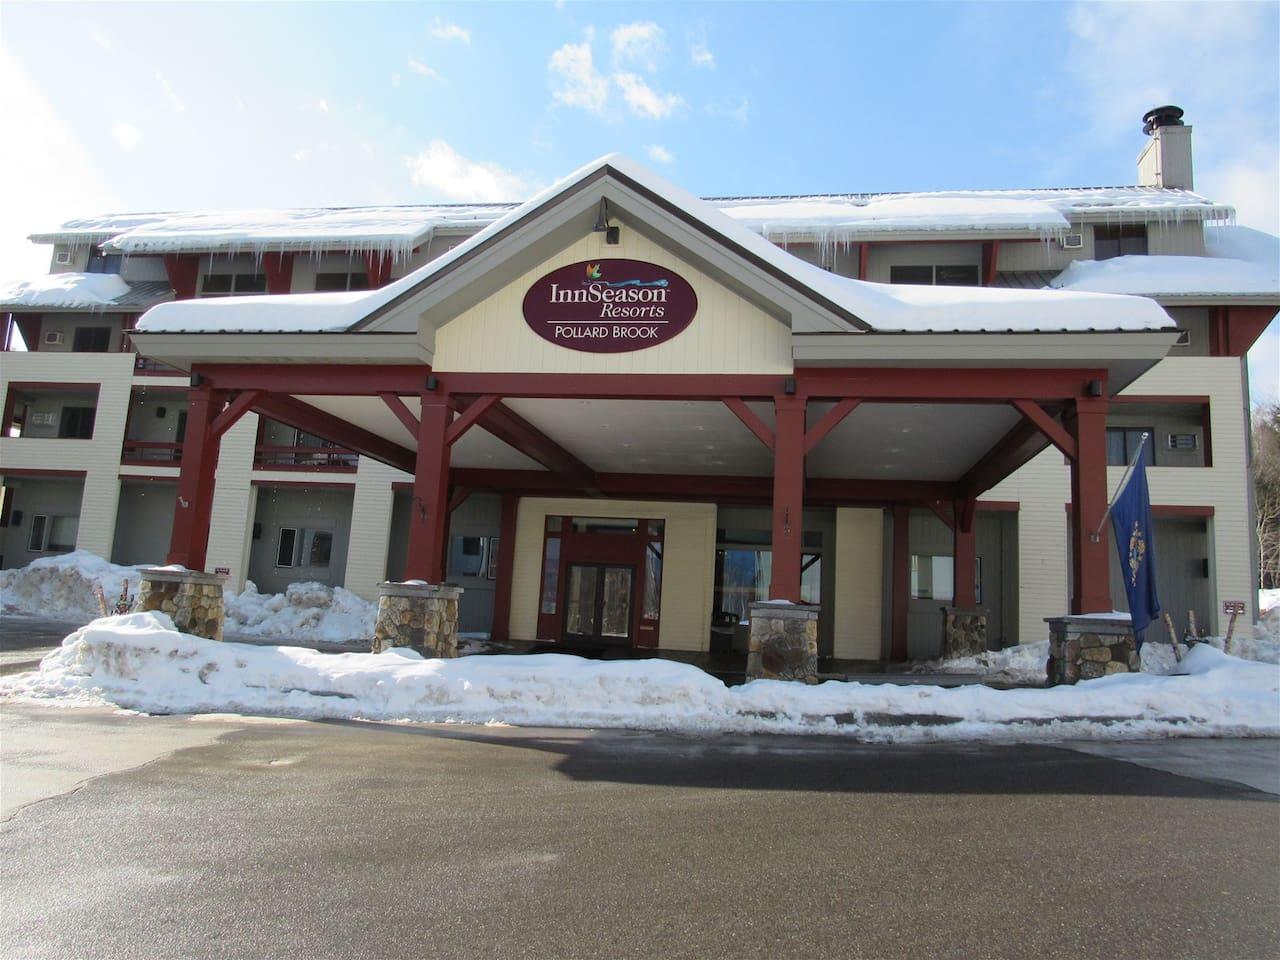 Winter at Pollard Brook Resort